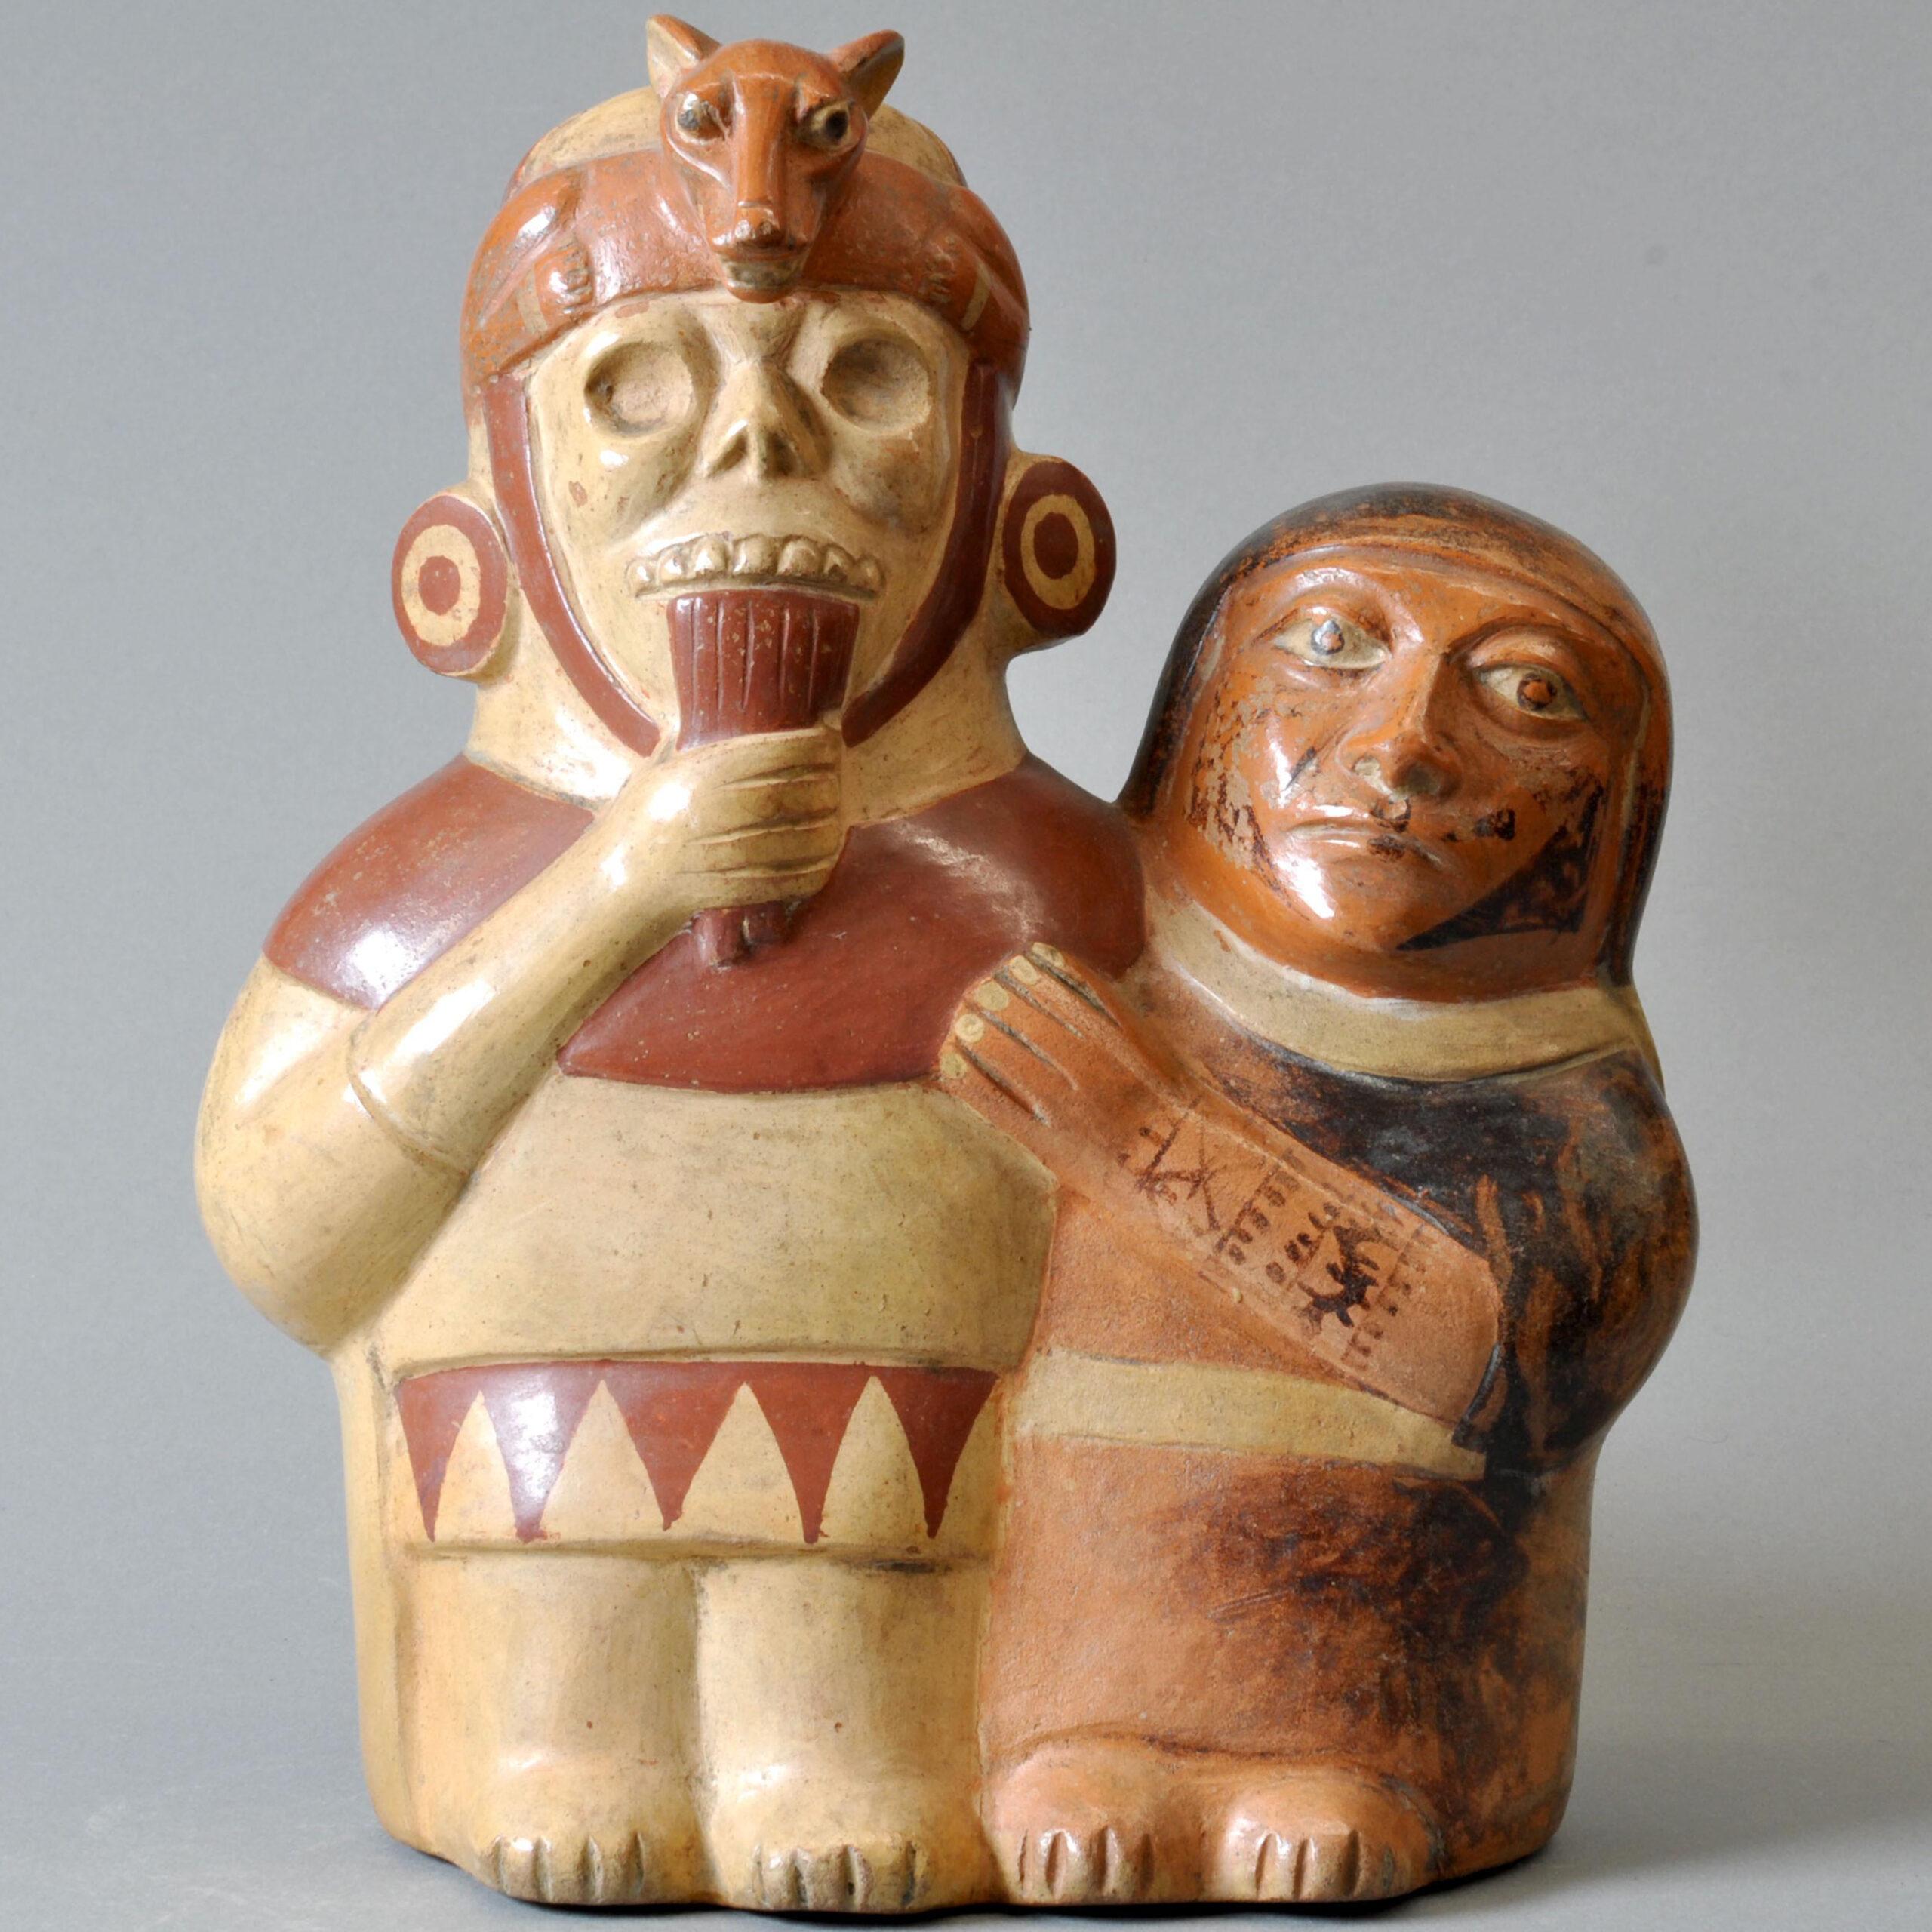 A ceramic figurine from the Moche culture of the north coast of Peru, depicting a human figure playing the panpipe. © Aguirre-Fernández/ Museum zu Allerheiligen Schaffhausen, Sammlung Ebnöther.